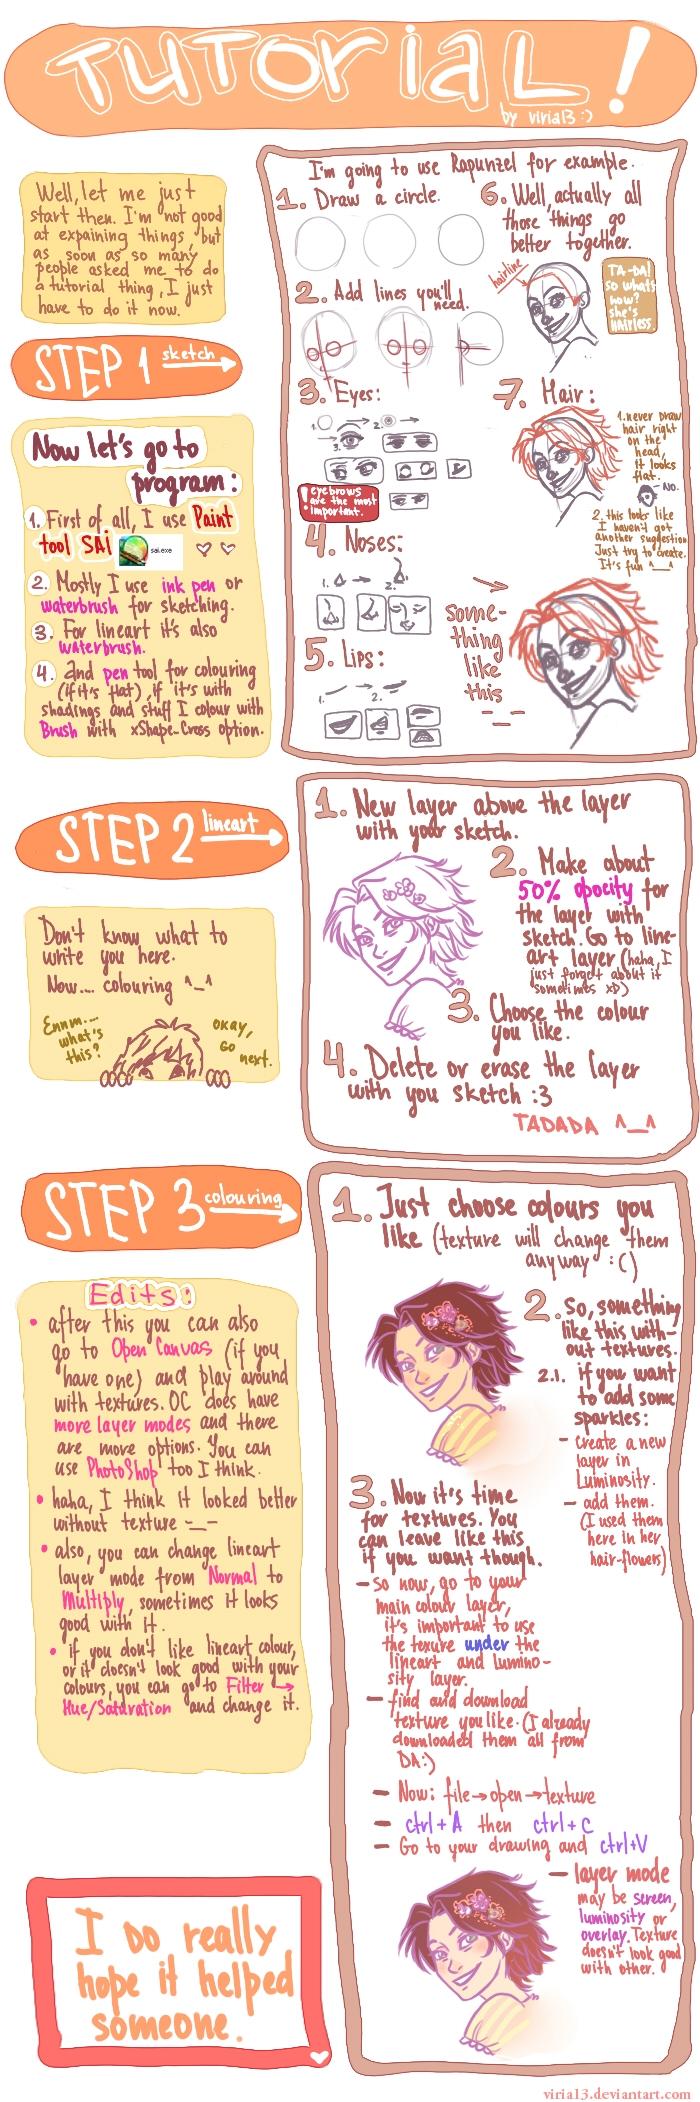 tutorial by viria13